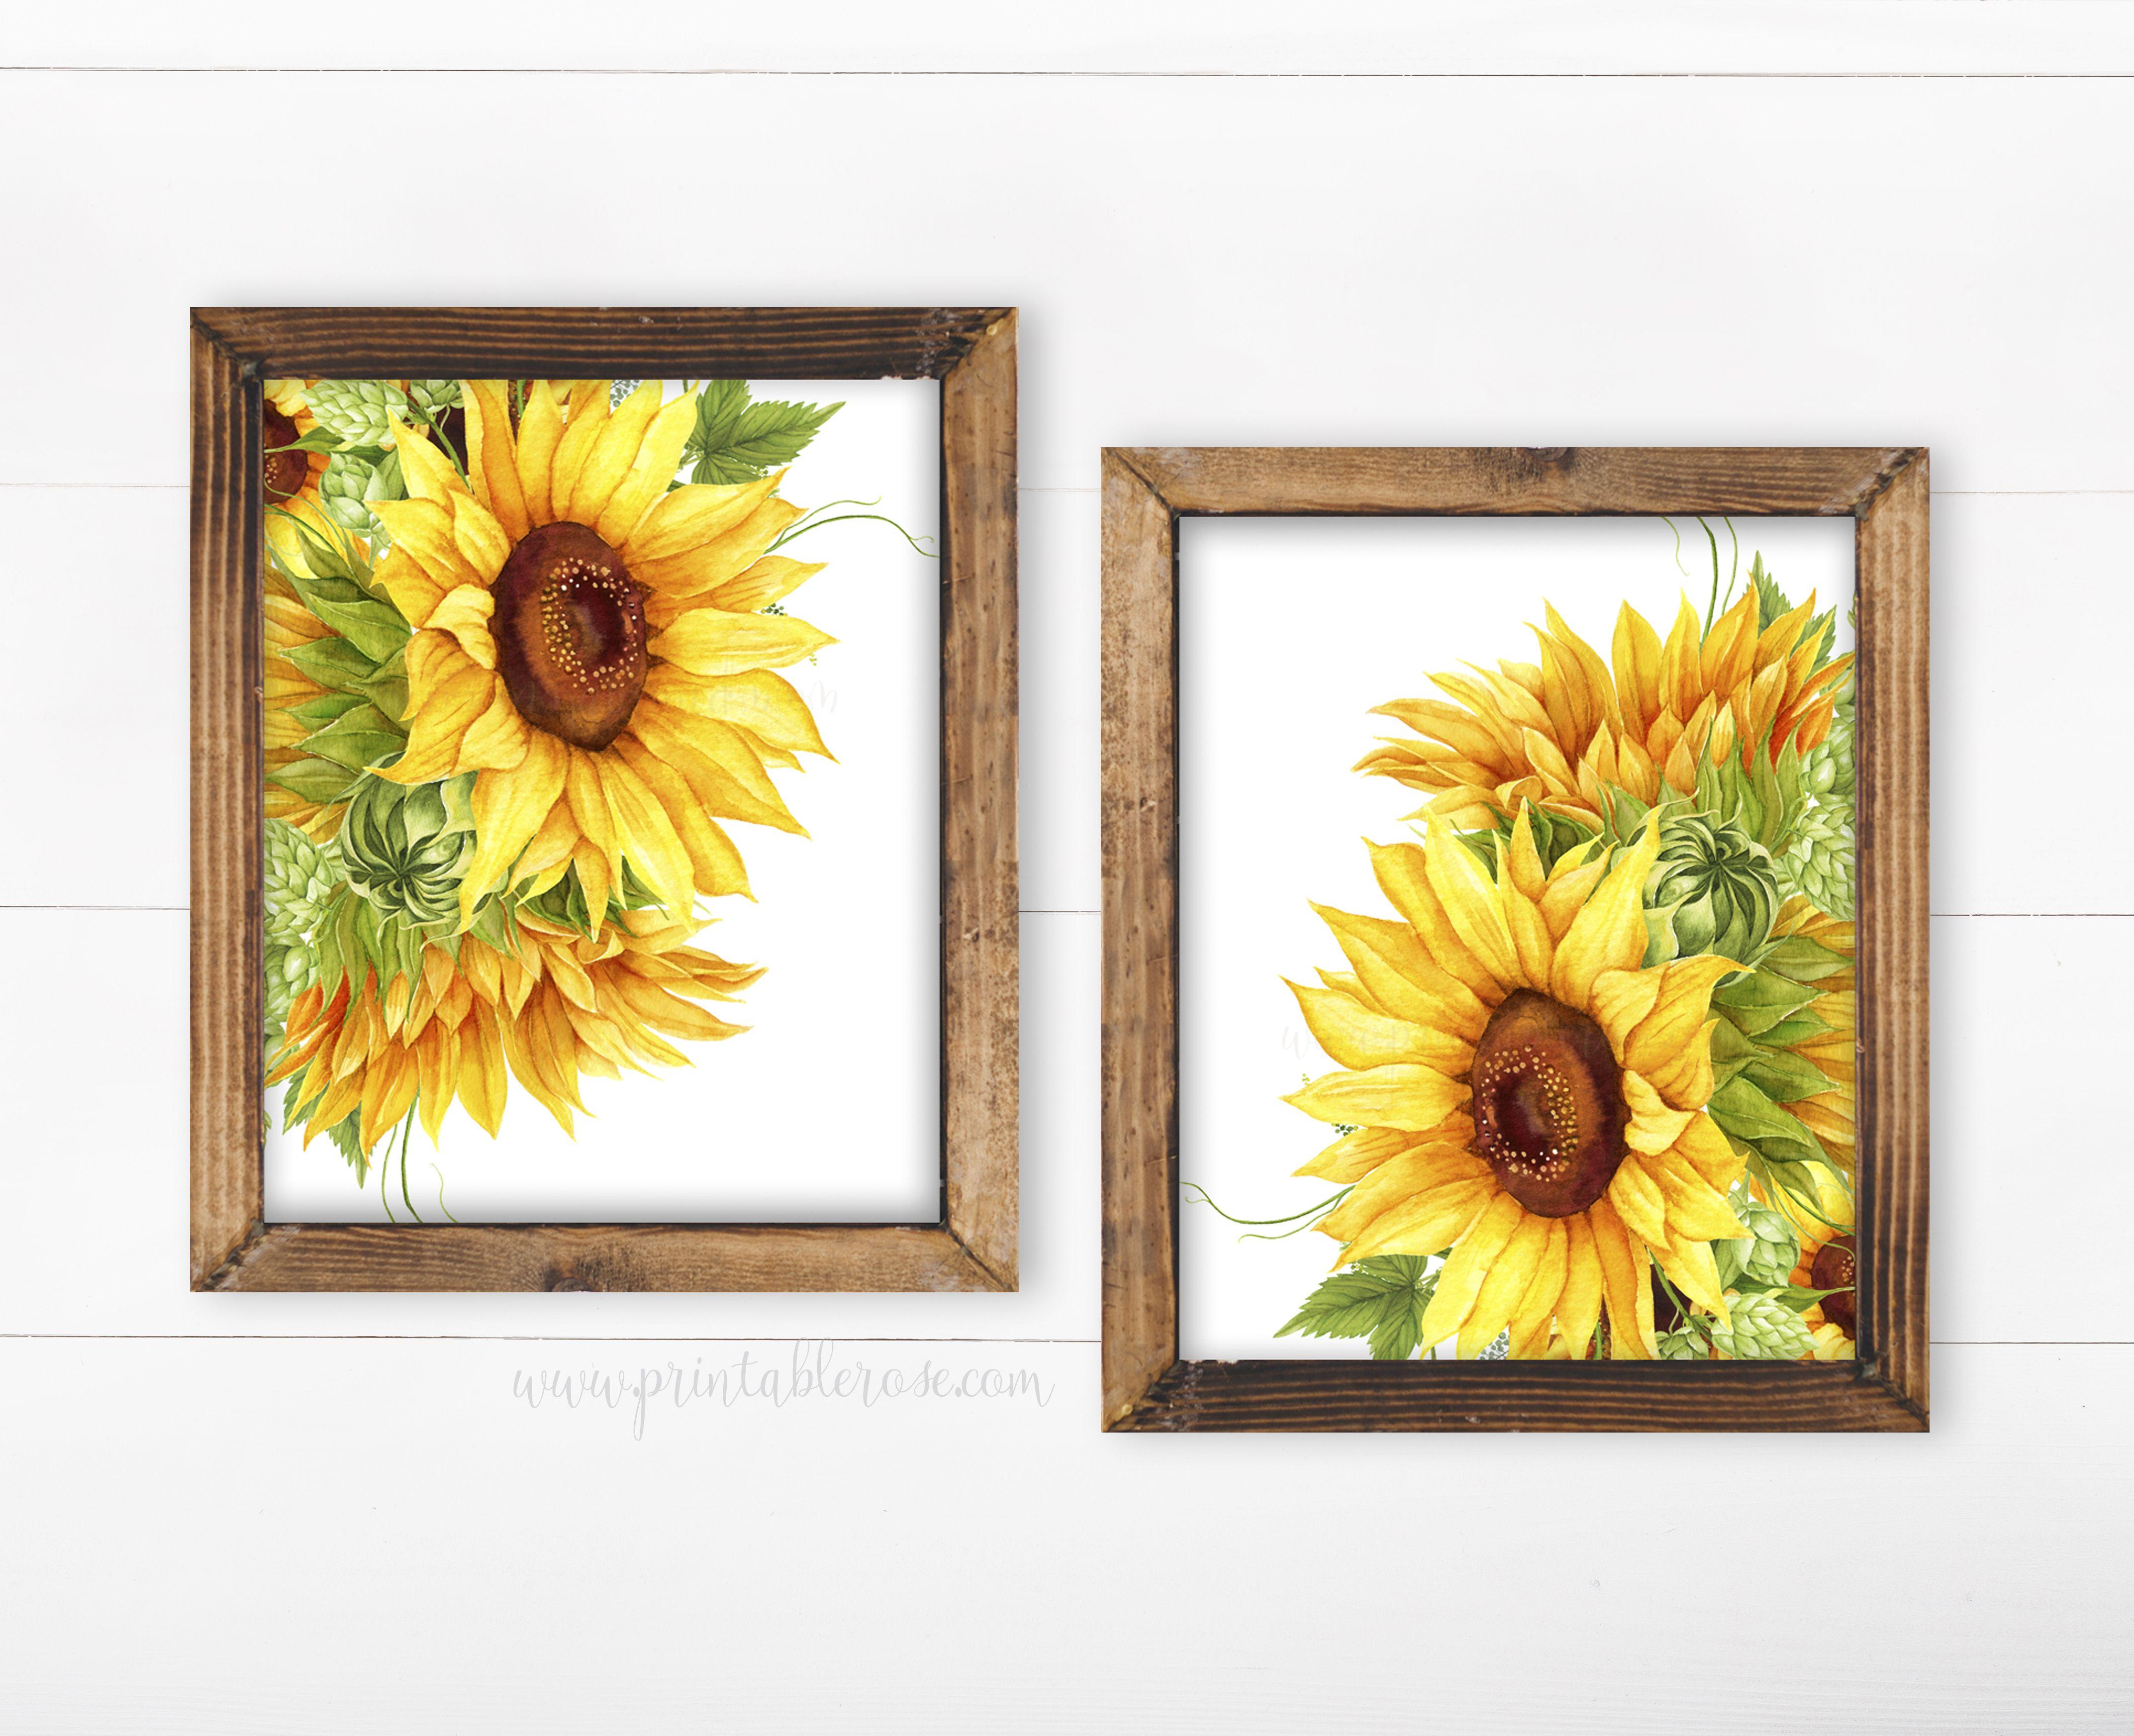 Sunflower Wall Decor Wall Art Printable Flower Decor Etsy In 2021 Sunflower Wall Decor Sunflower Wall Art Flower Room Decor